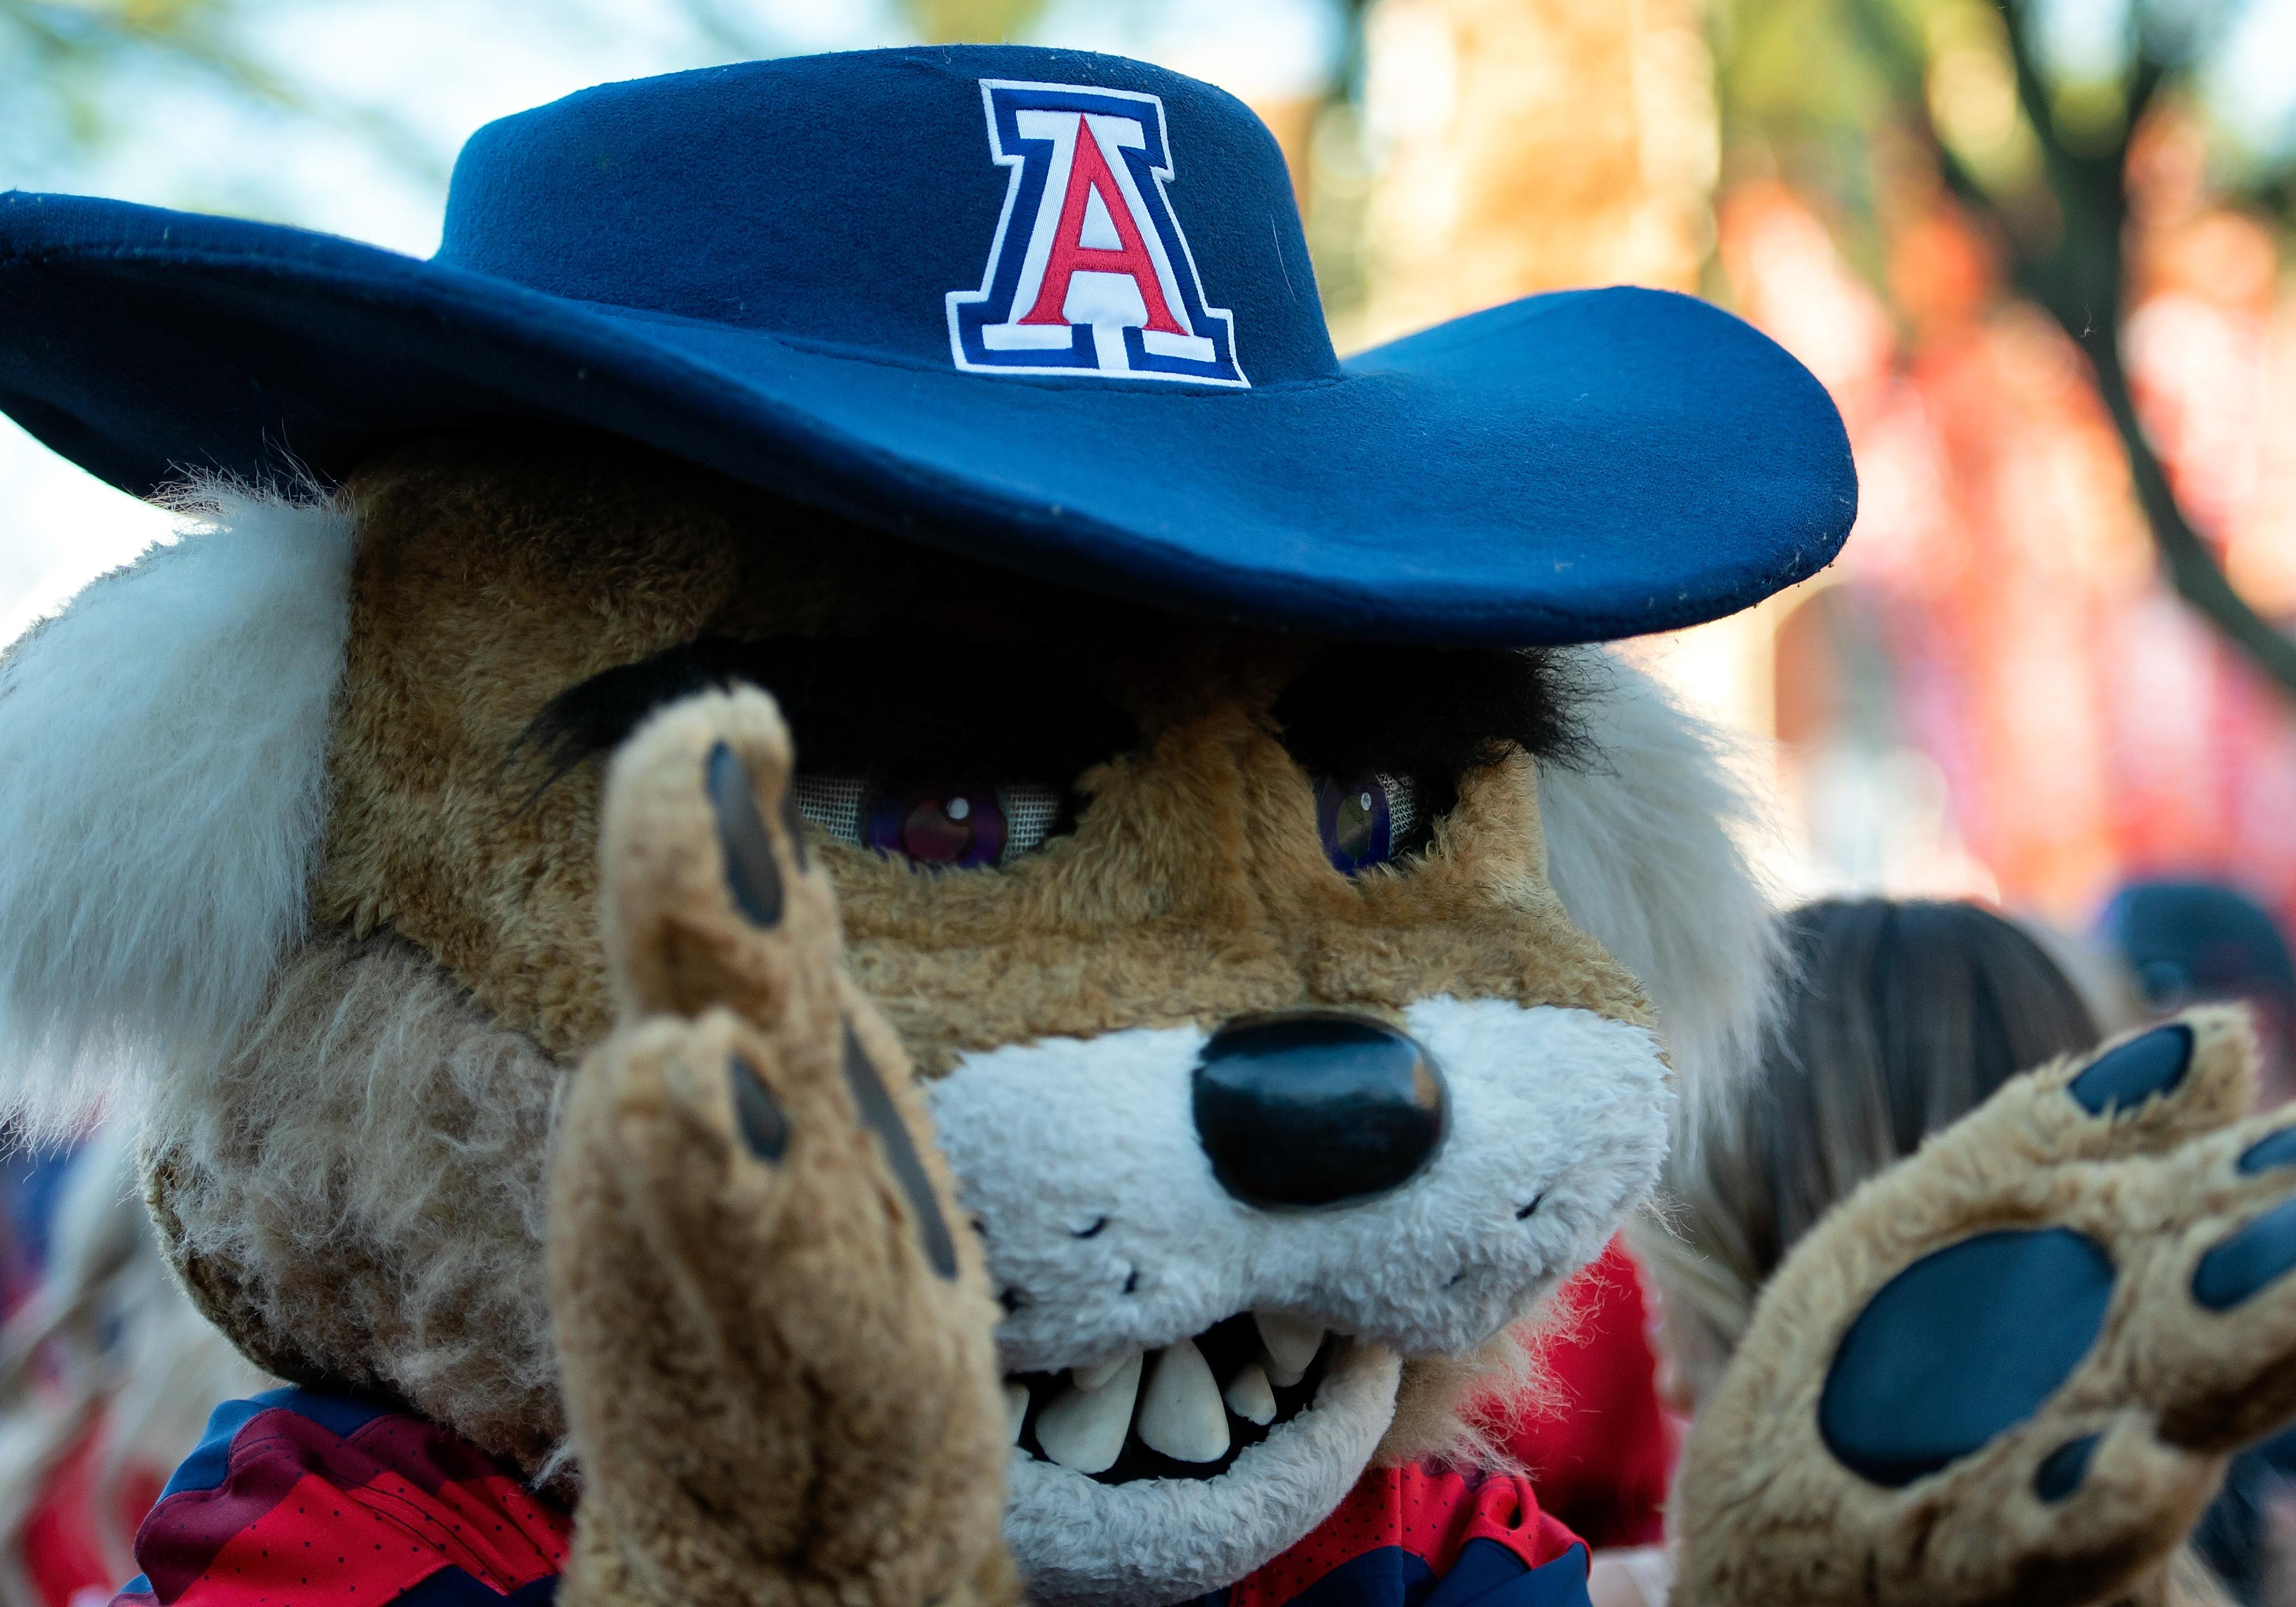 arizona-wildcats-washington-huskies-game-thread-live-updates-pac12-football-chat